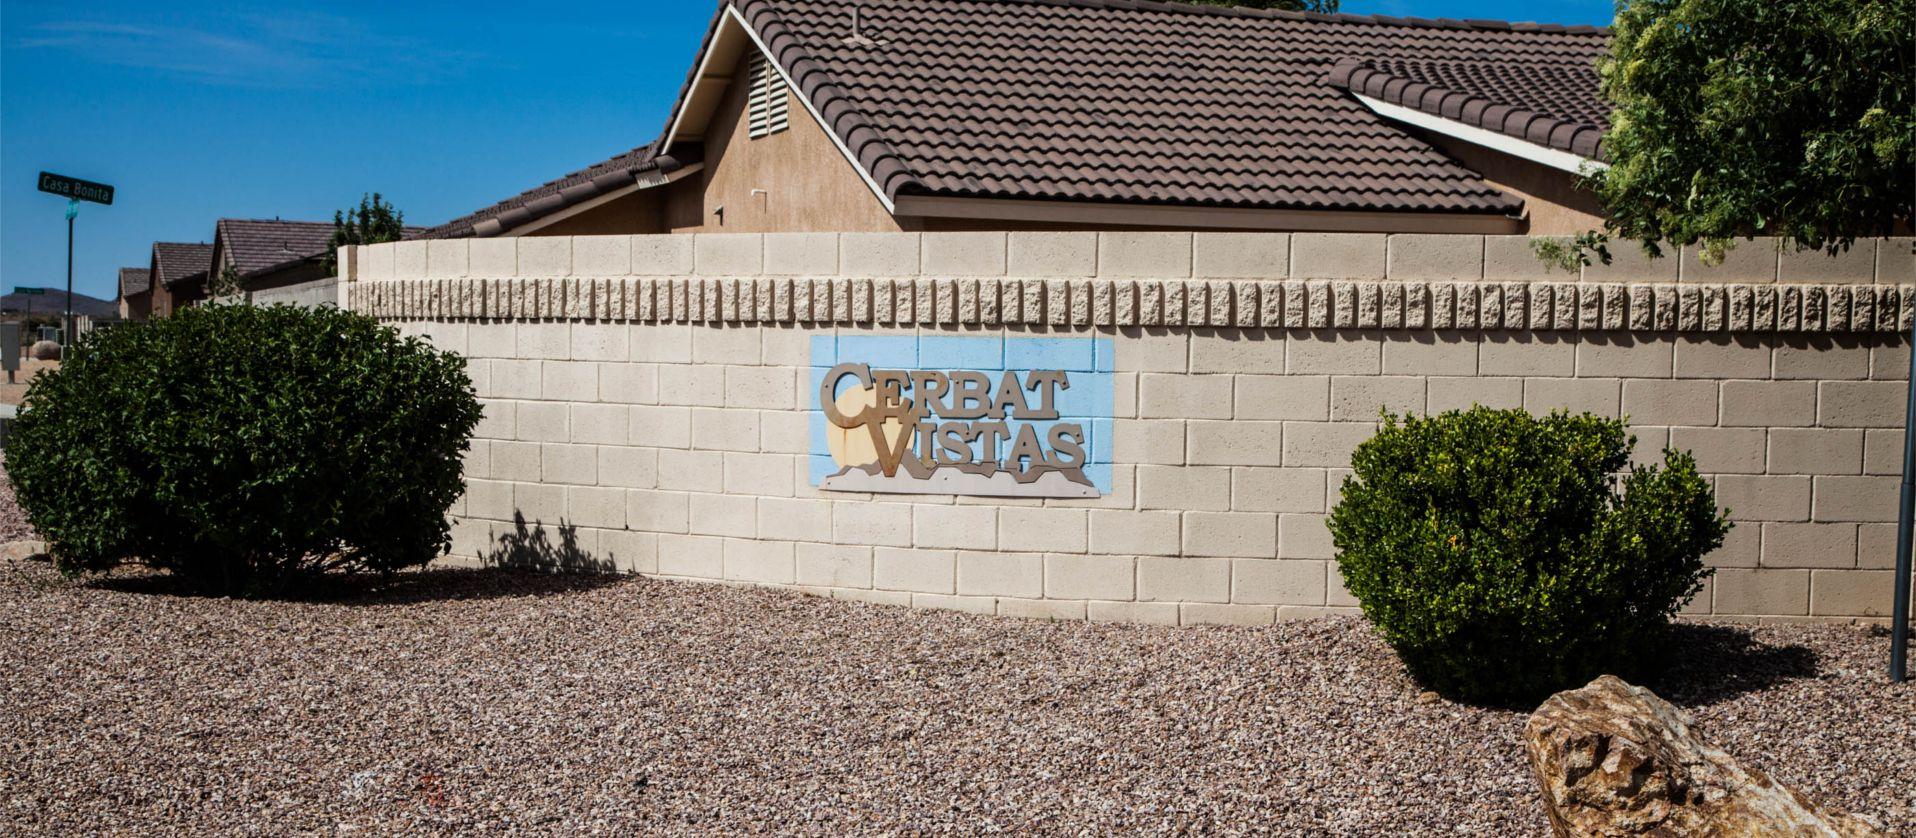 'Cerbat Vistas' by Angle Homes webArchitect in Kingman-Lake Havasu City